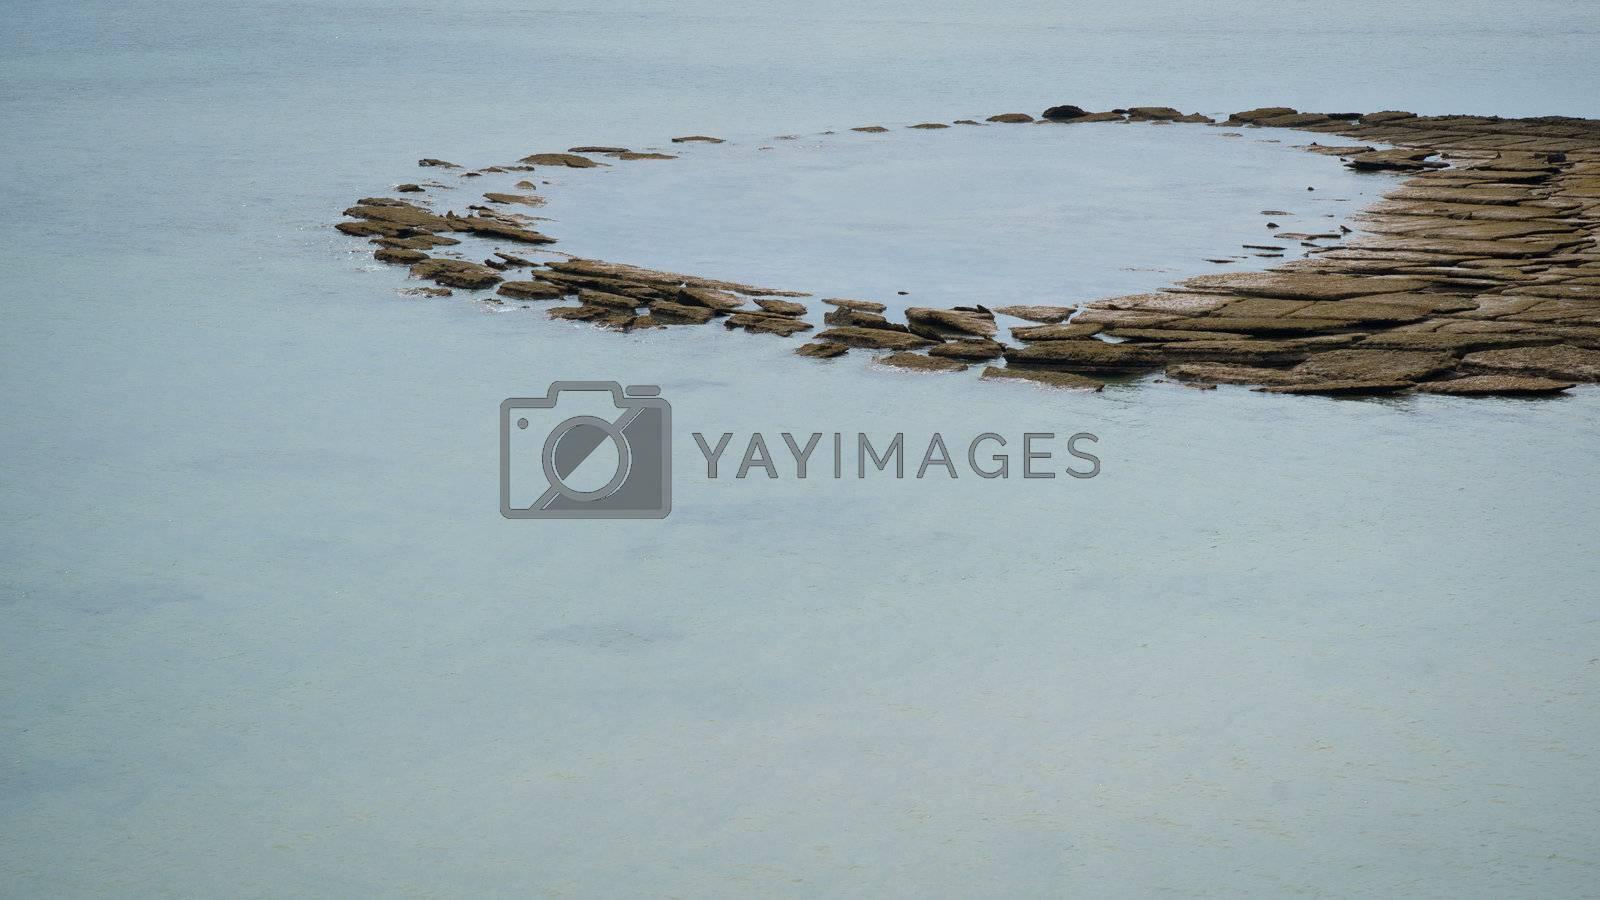 Gastropod fossil in Andaman sea, Thailand, Krabi province